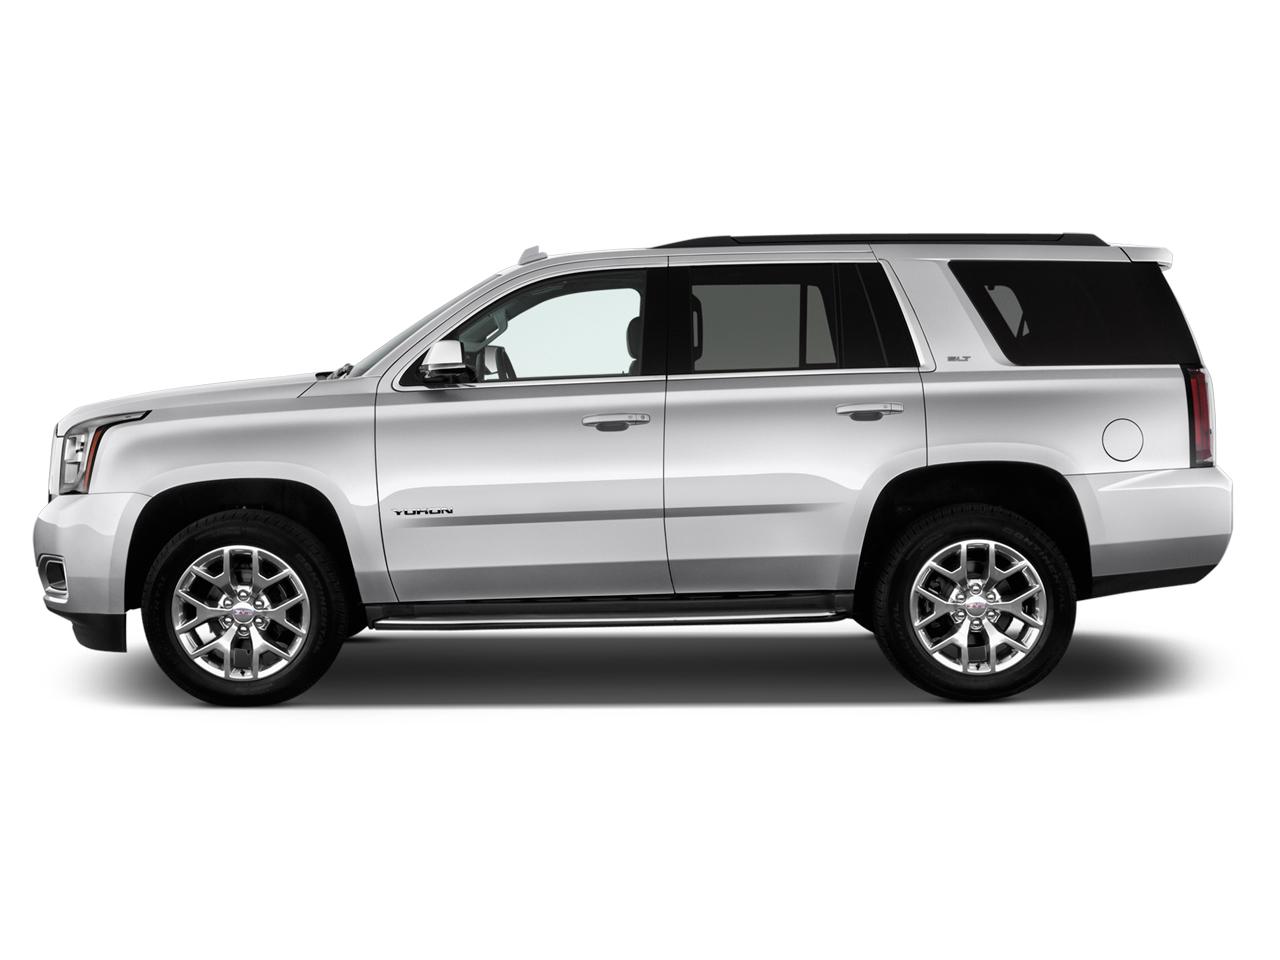 GMC Yukon 2019 5.3L SLE (2WD), Saudi Arabia